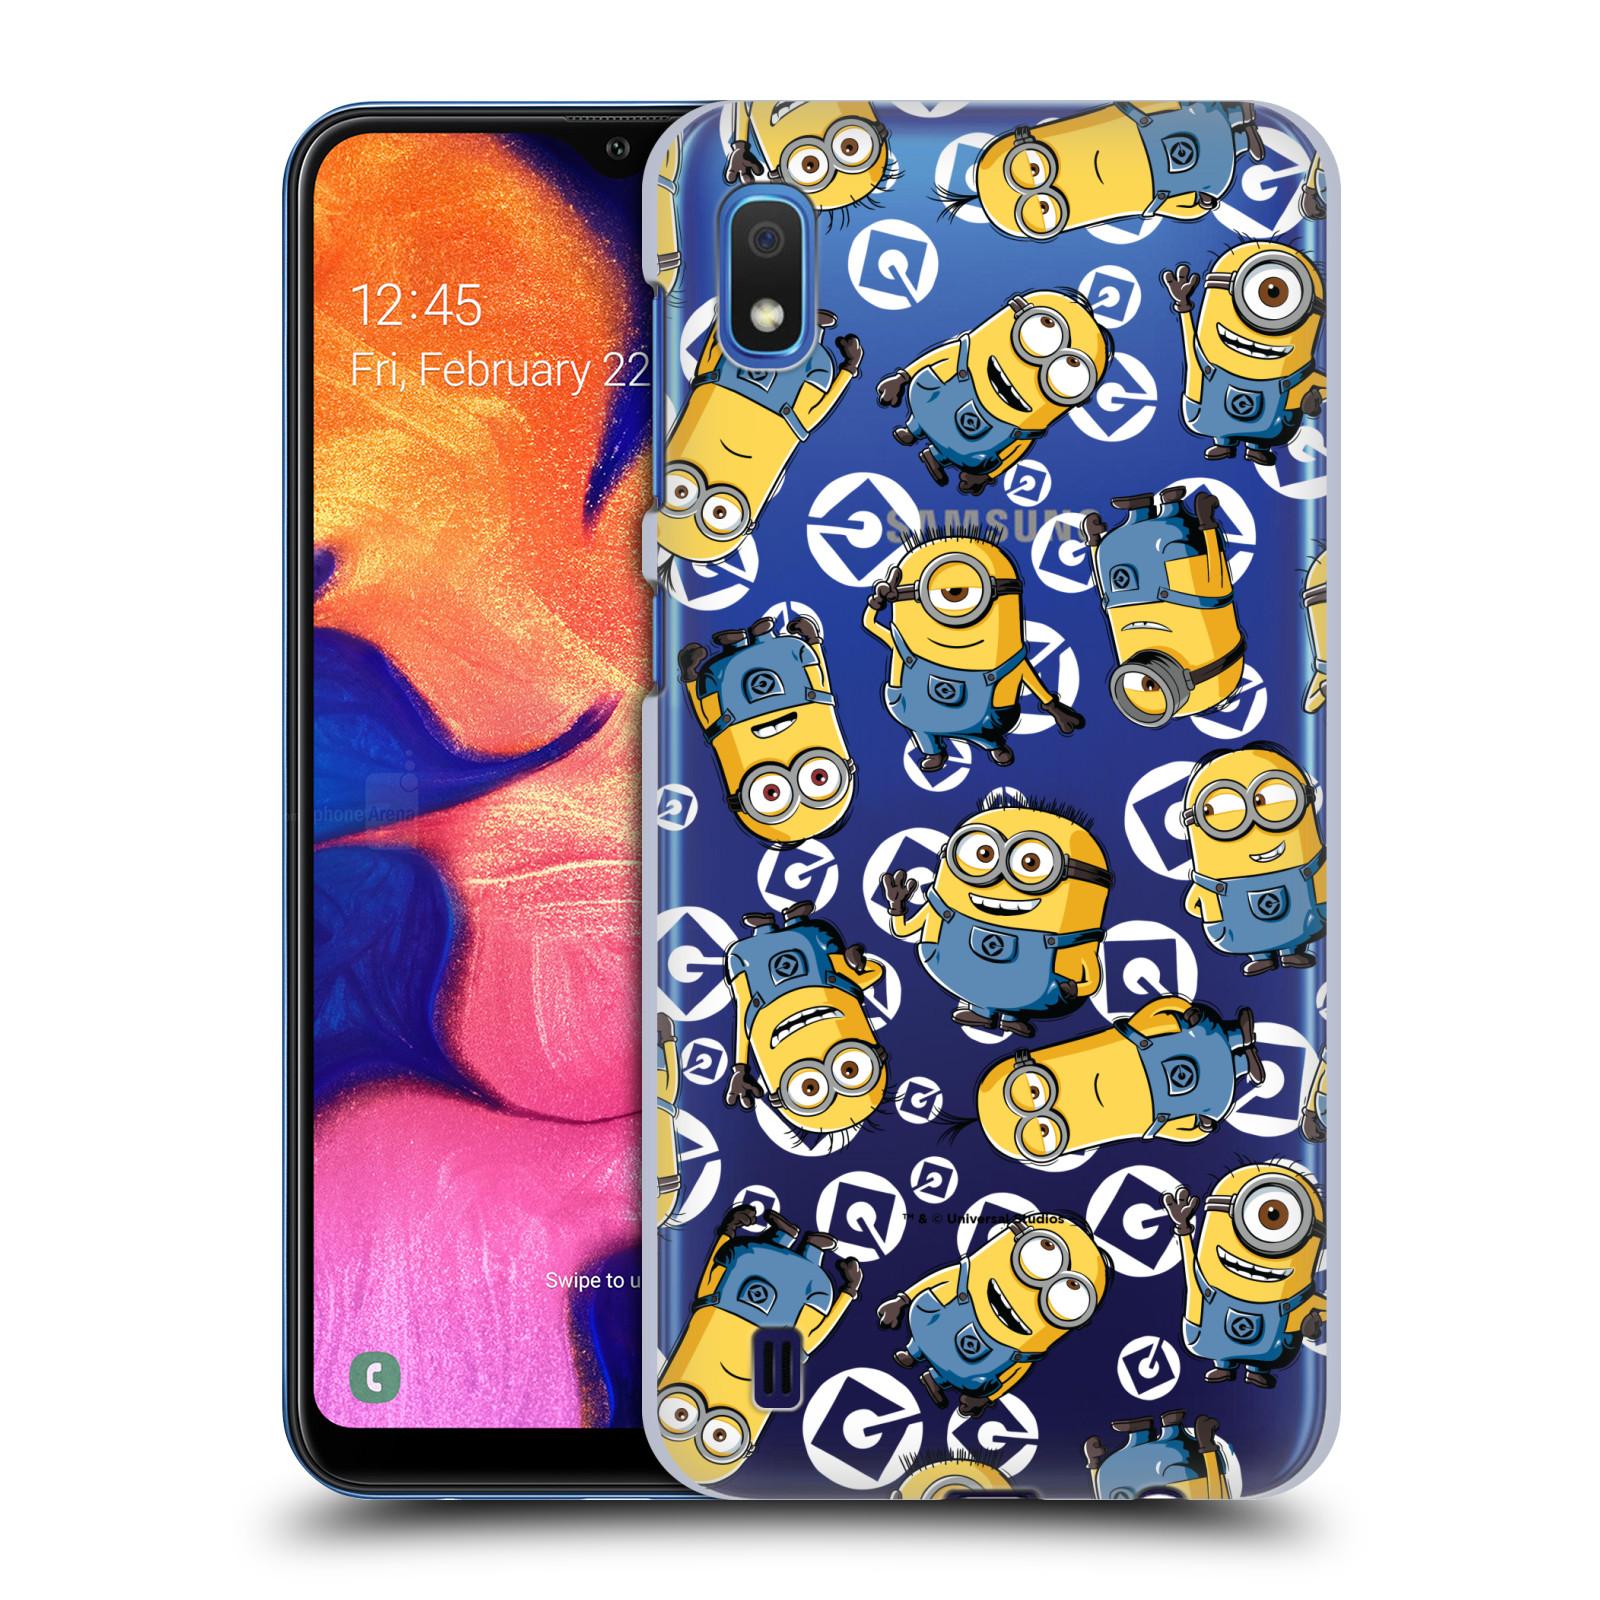 Plastové pouzdro na mobil Samsung Galaxy A10 - Head Case - Minion pattern z filmu Já, padouch - Despicable Me